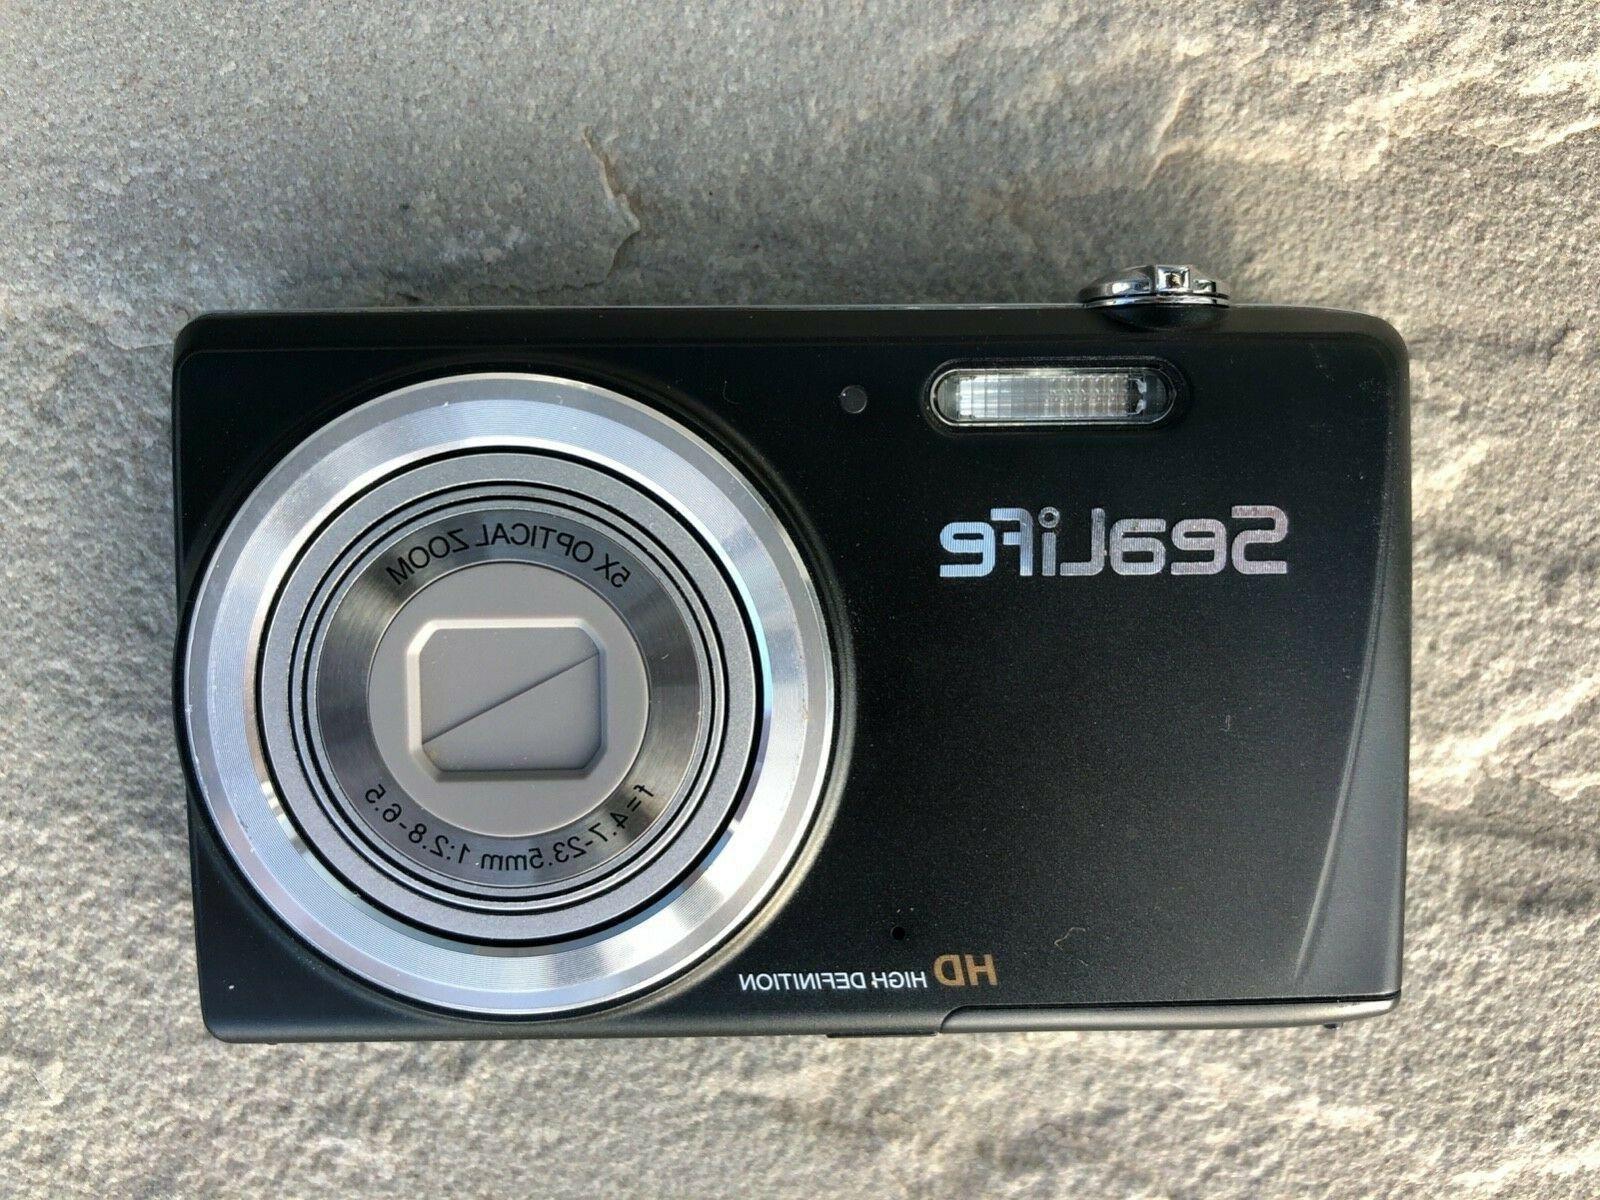 Sealife DC1400 Underwater Camera with Video